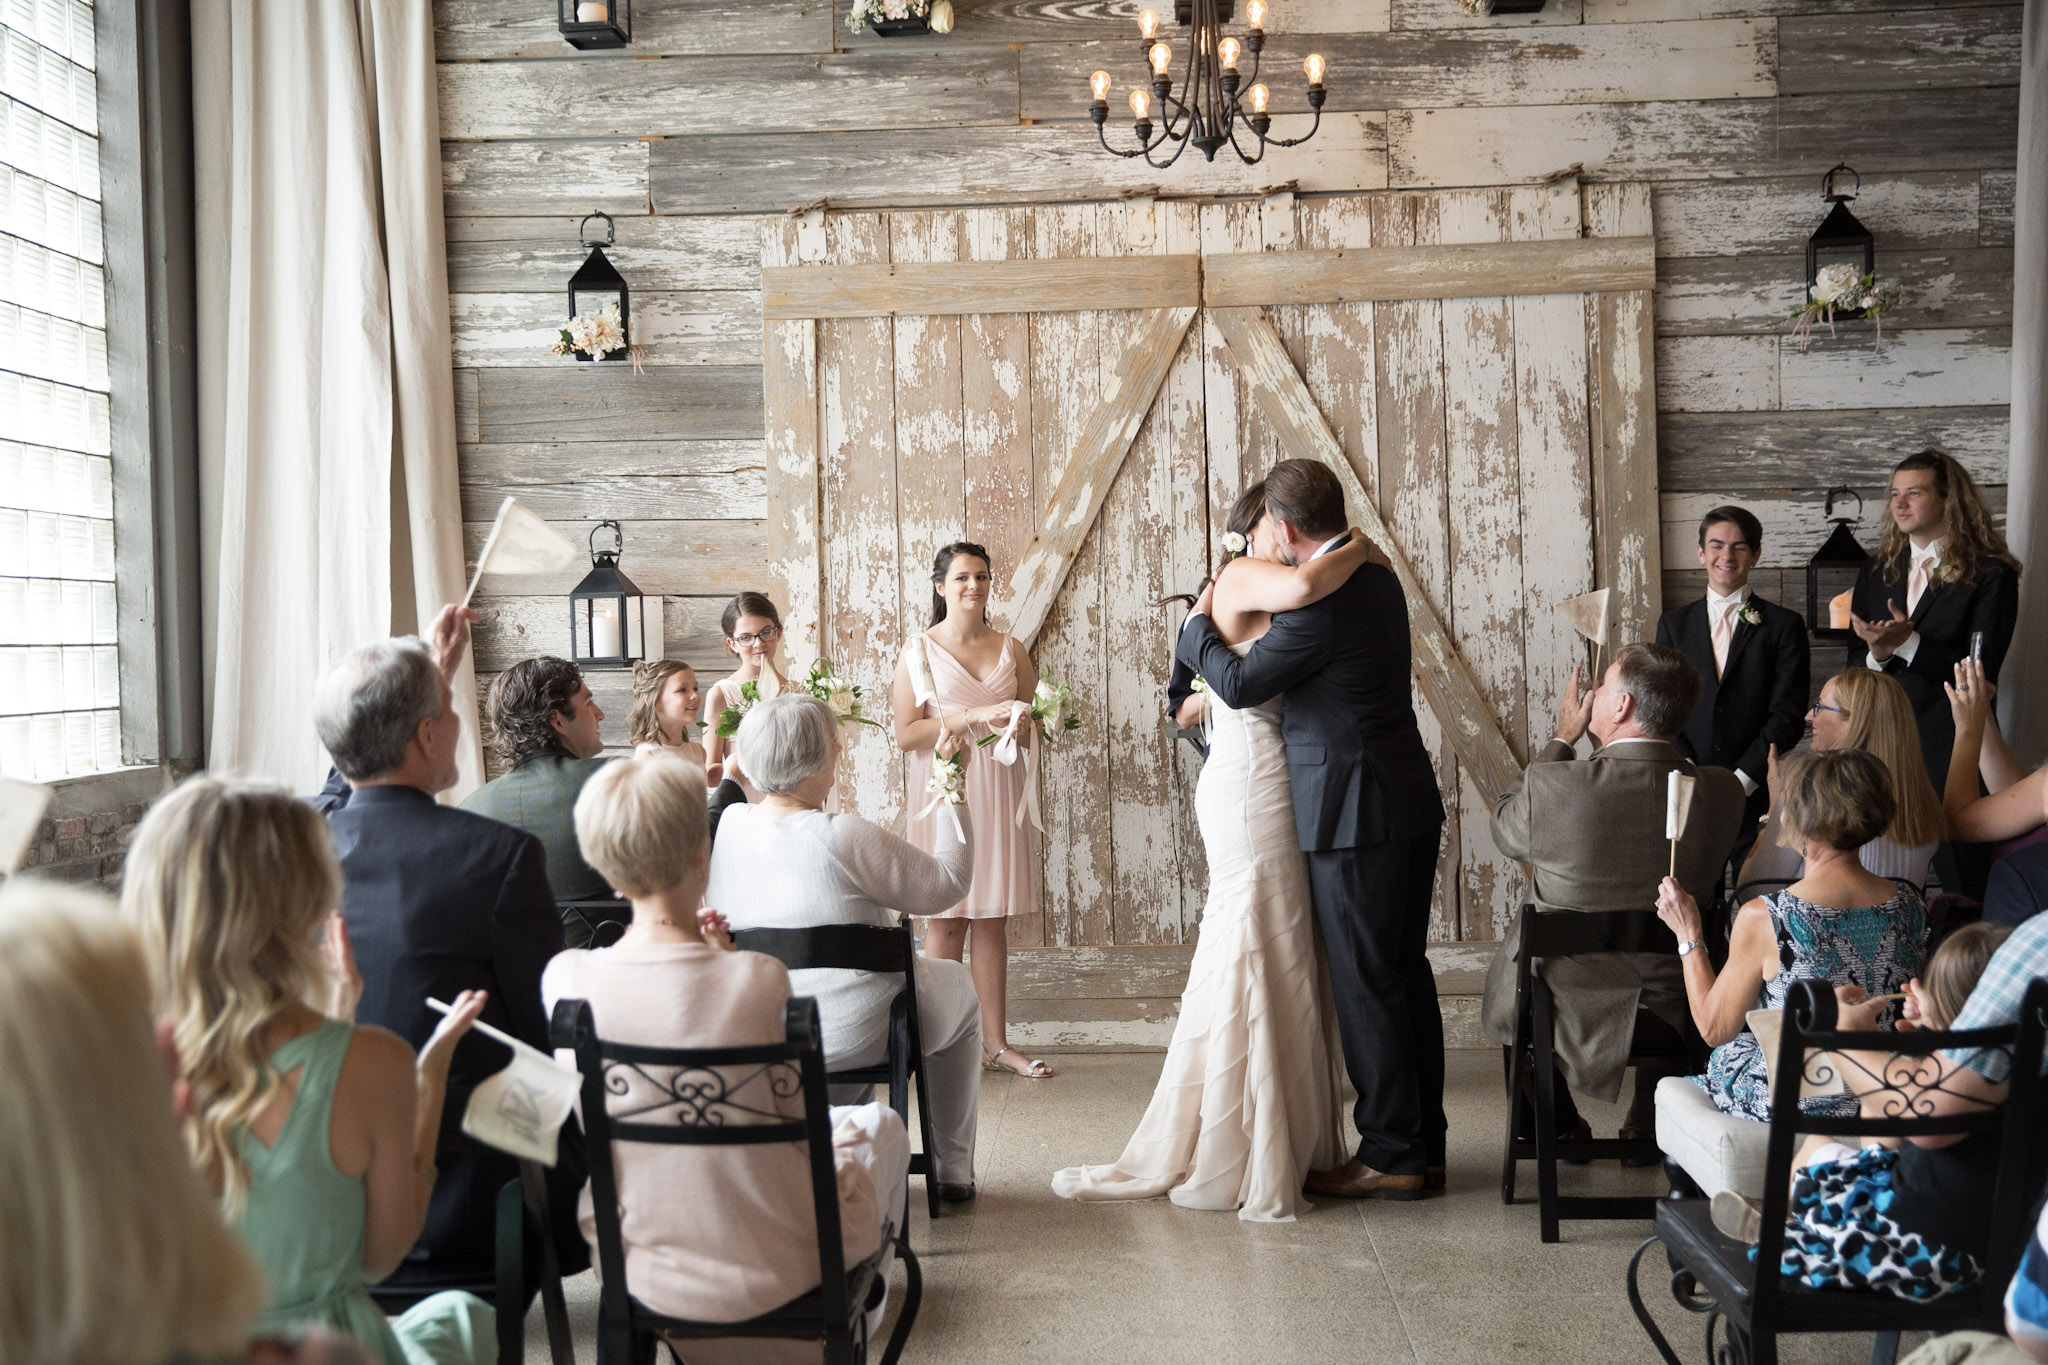 The_Vow_Exchange_Kansas_City_Small_Budget_Wedding_Venue_Kiersten&Brice_IMG-92.jpg